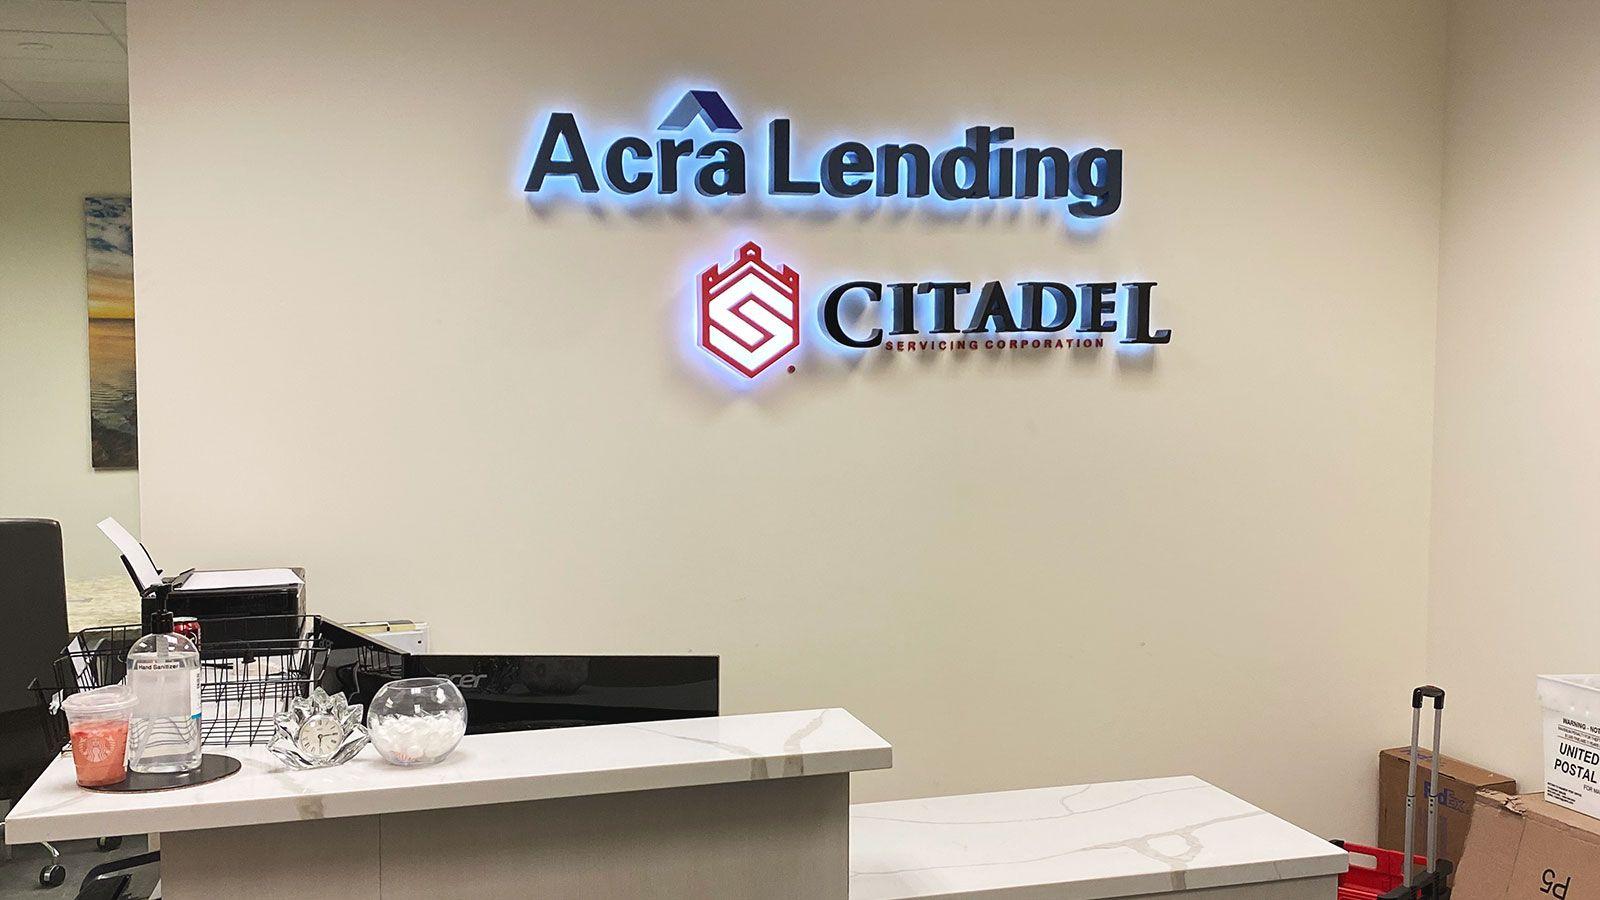 Acra Lending Backlit letters